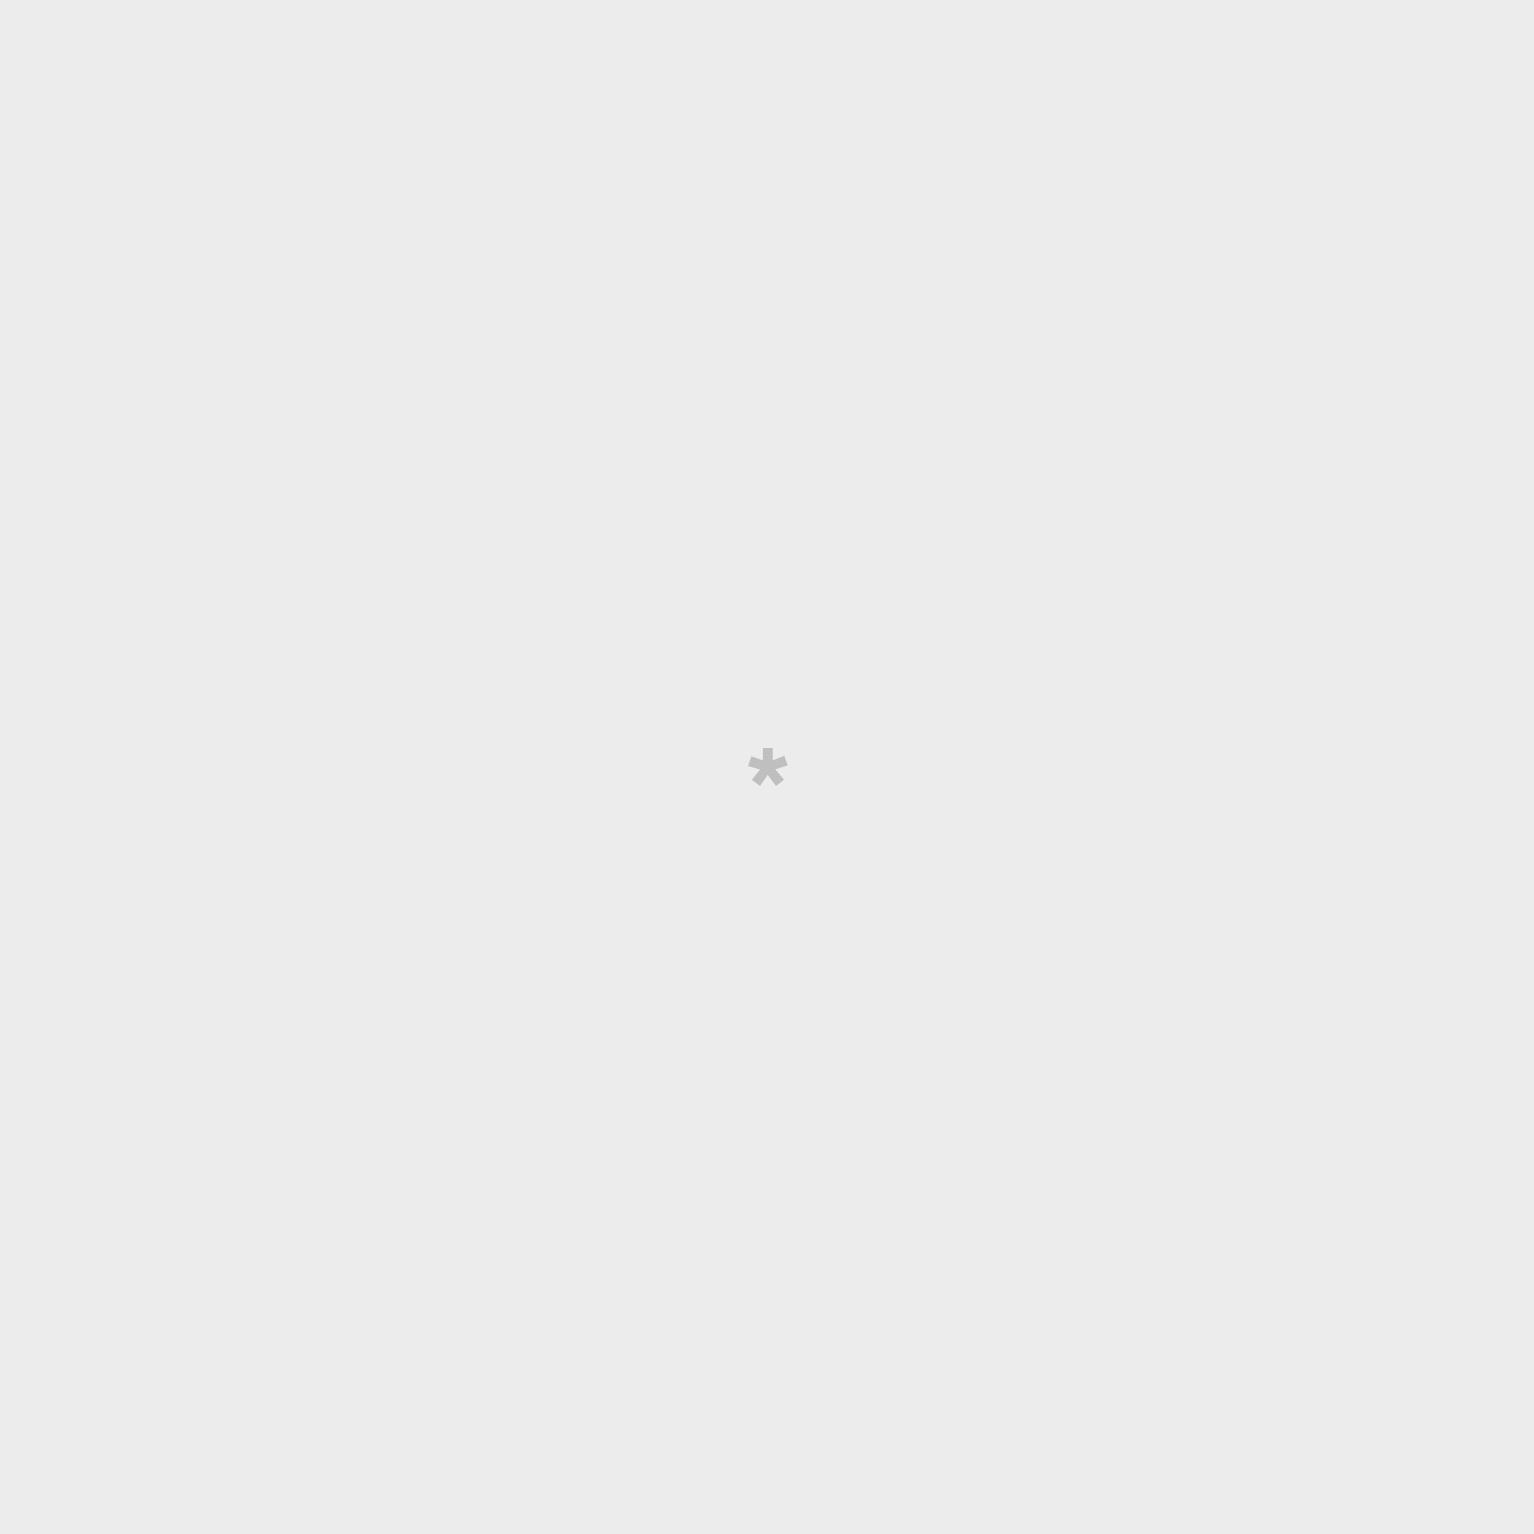 Guarda-chuva pequeno de viagem - Girls just wanna have sun